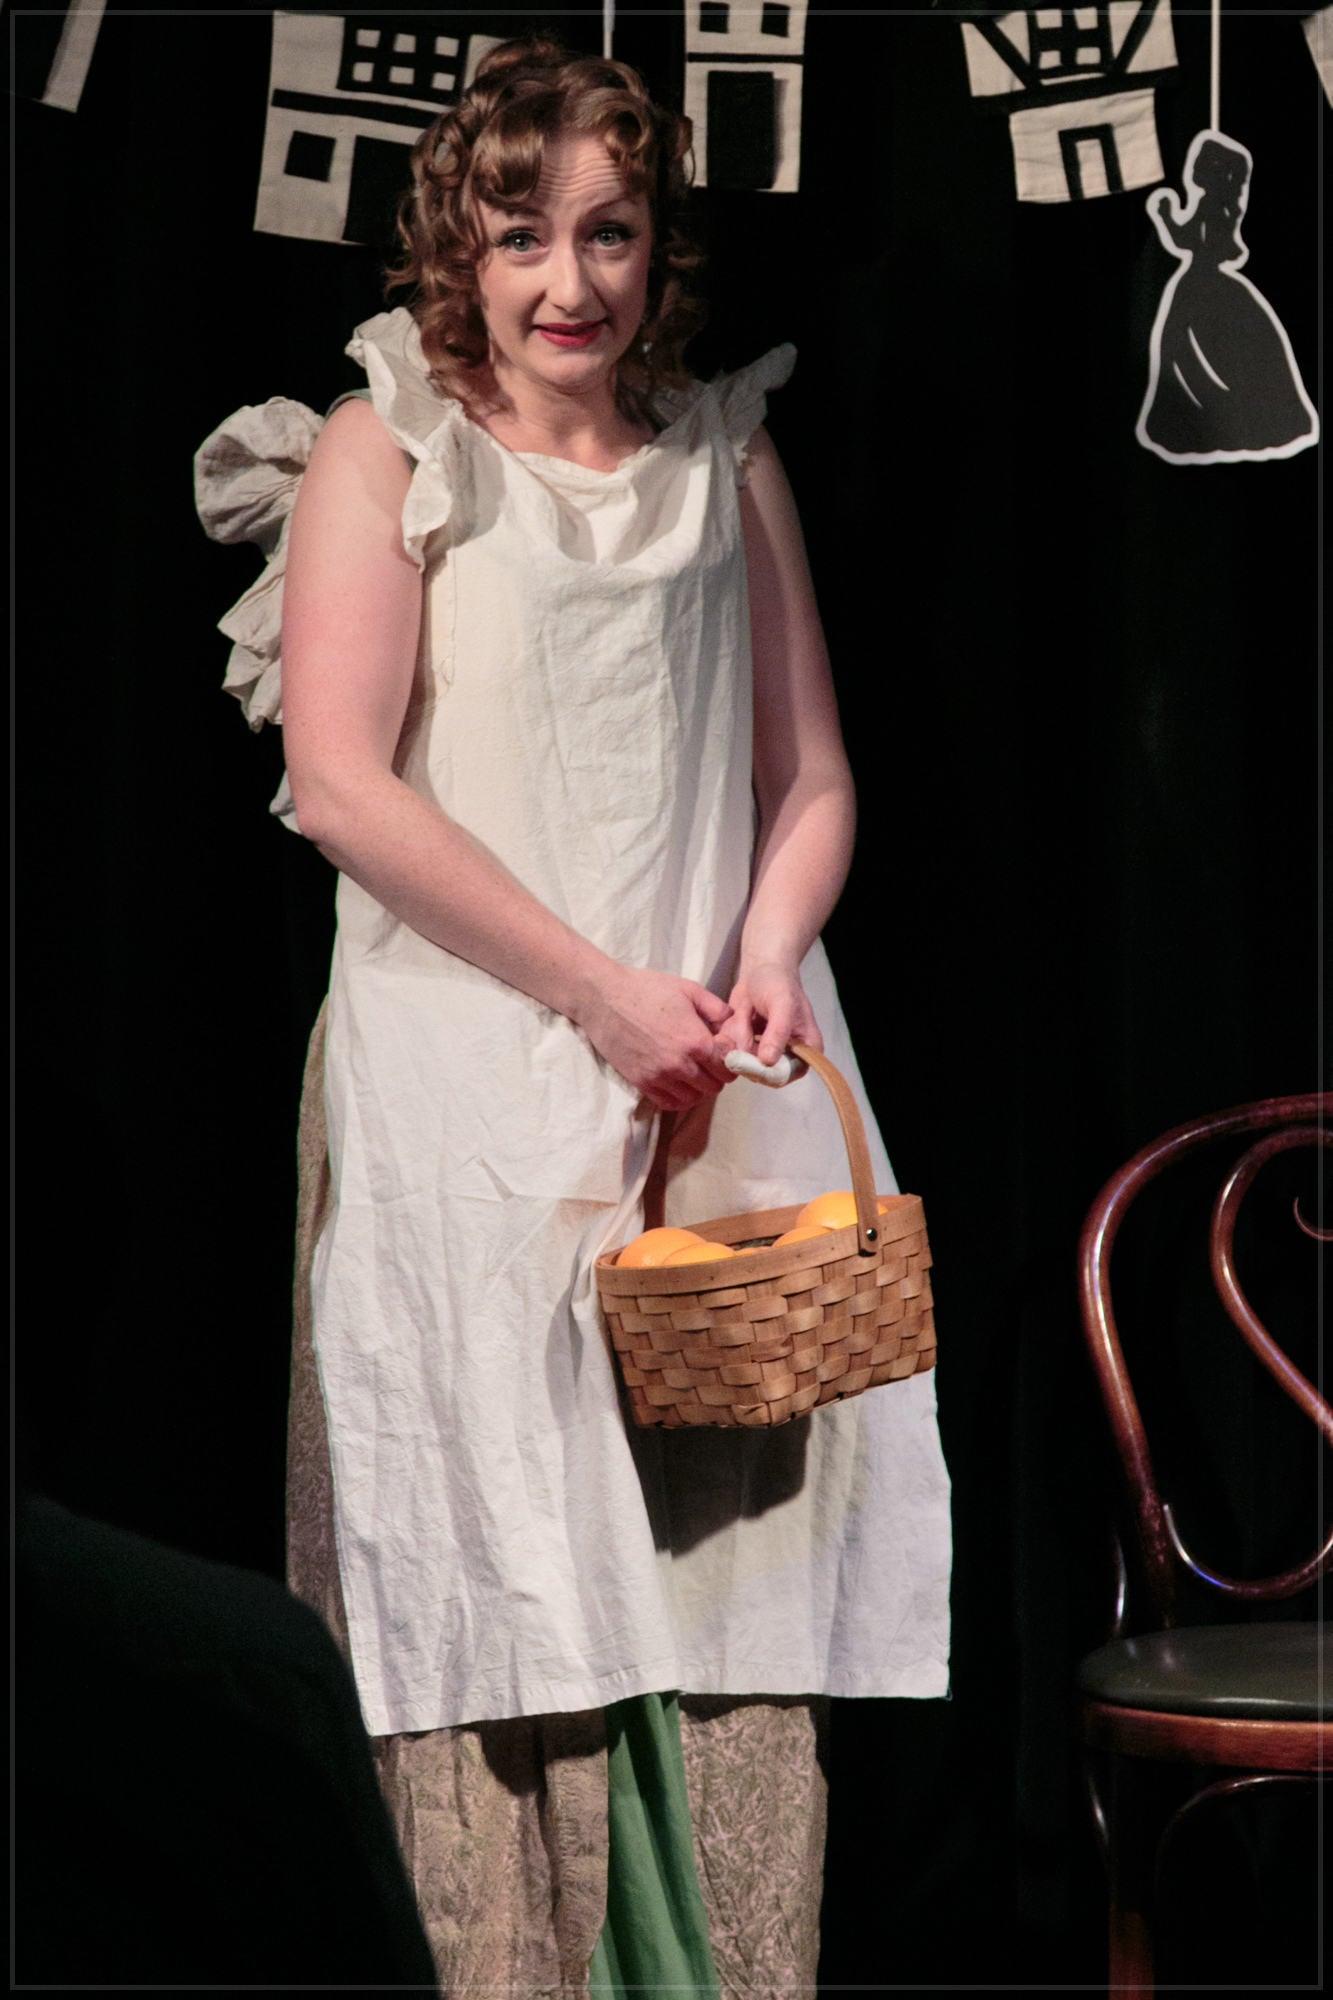 Ginger Blush - Nell Gwynn's History Laid Bare 041.jpg